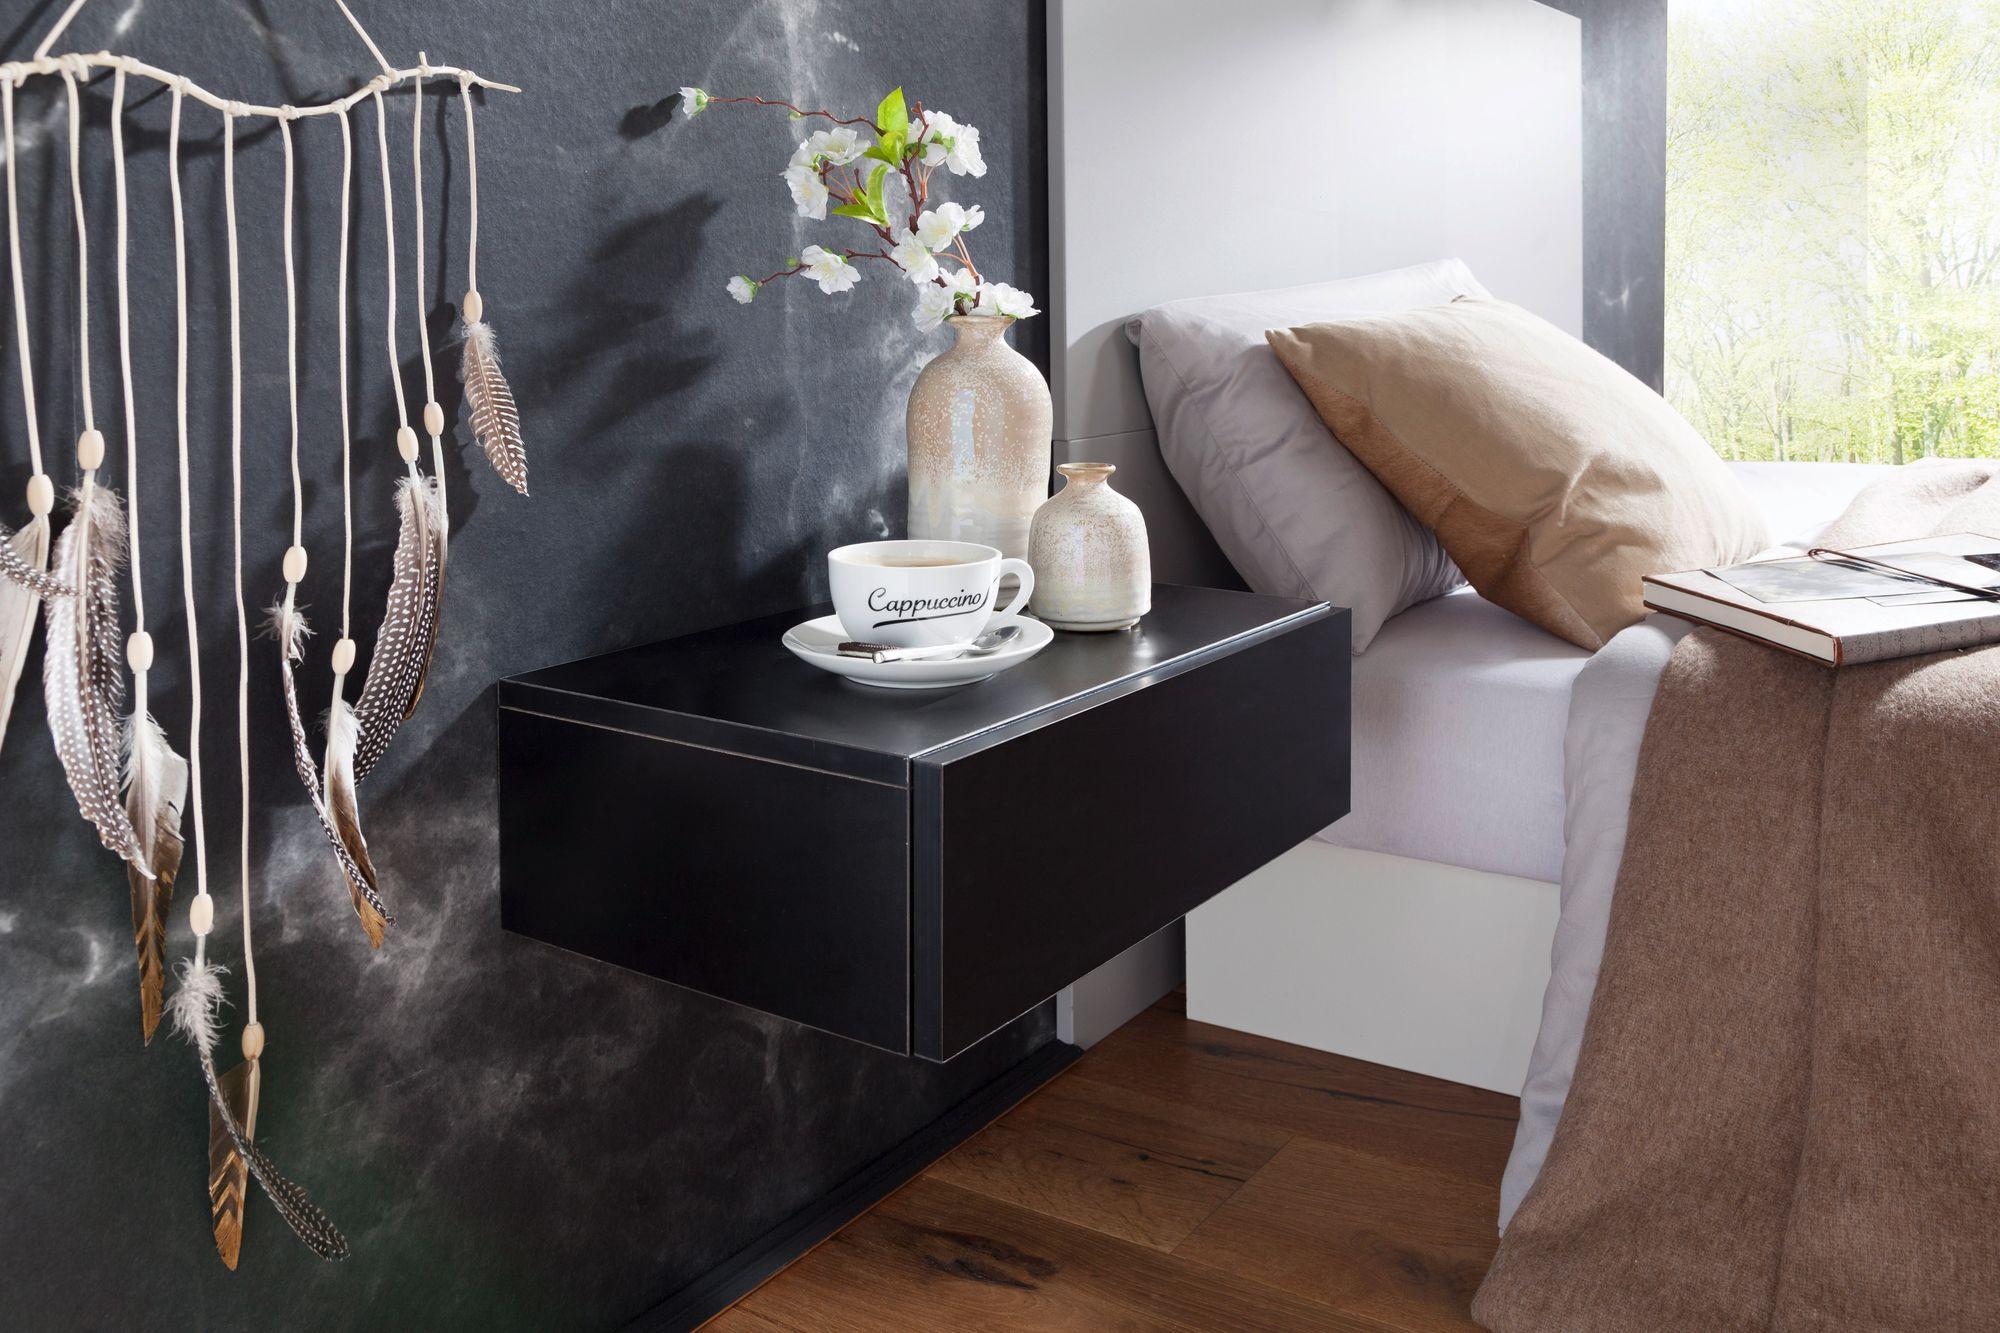 wandregal schublade nachtkommode nachtschrank h ngend schwebend wandboard schwar ebay. Black Bedroom Furniture Sets. Home Design Ideas